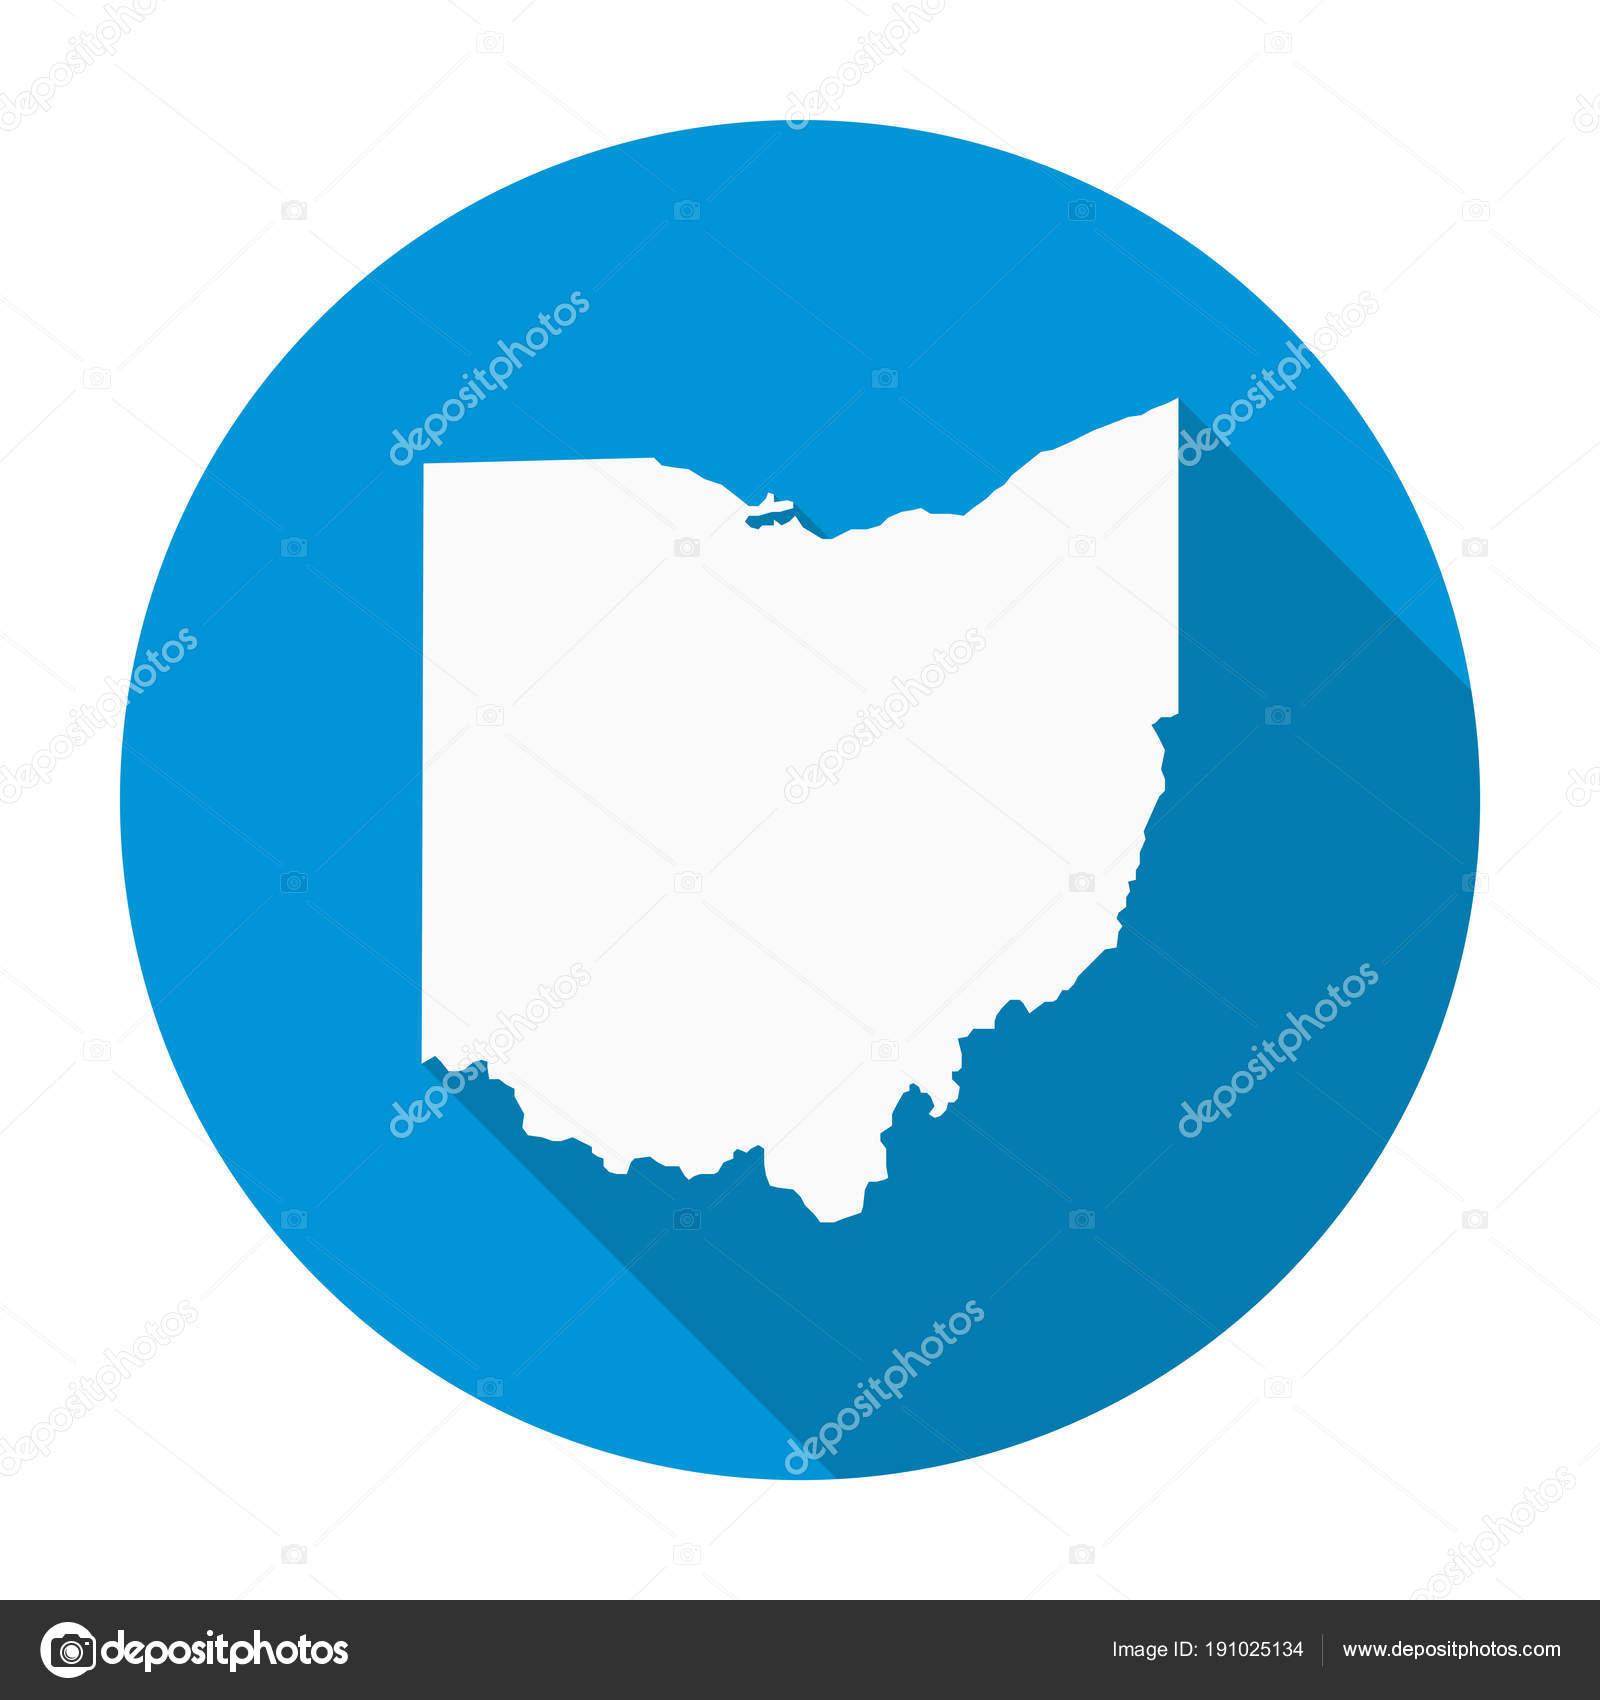 Ohio map flat icon stock vector nirodesign 191025134 ohio map flat icon stock vector gumiabroncs Images